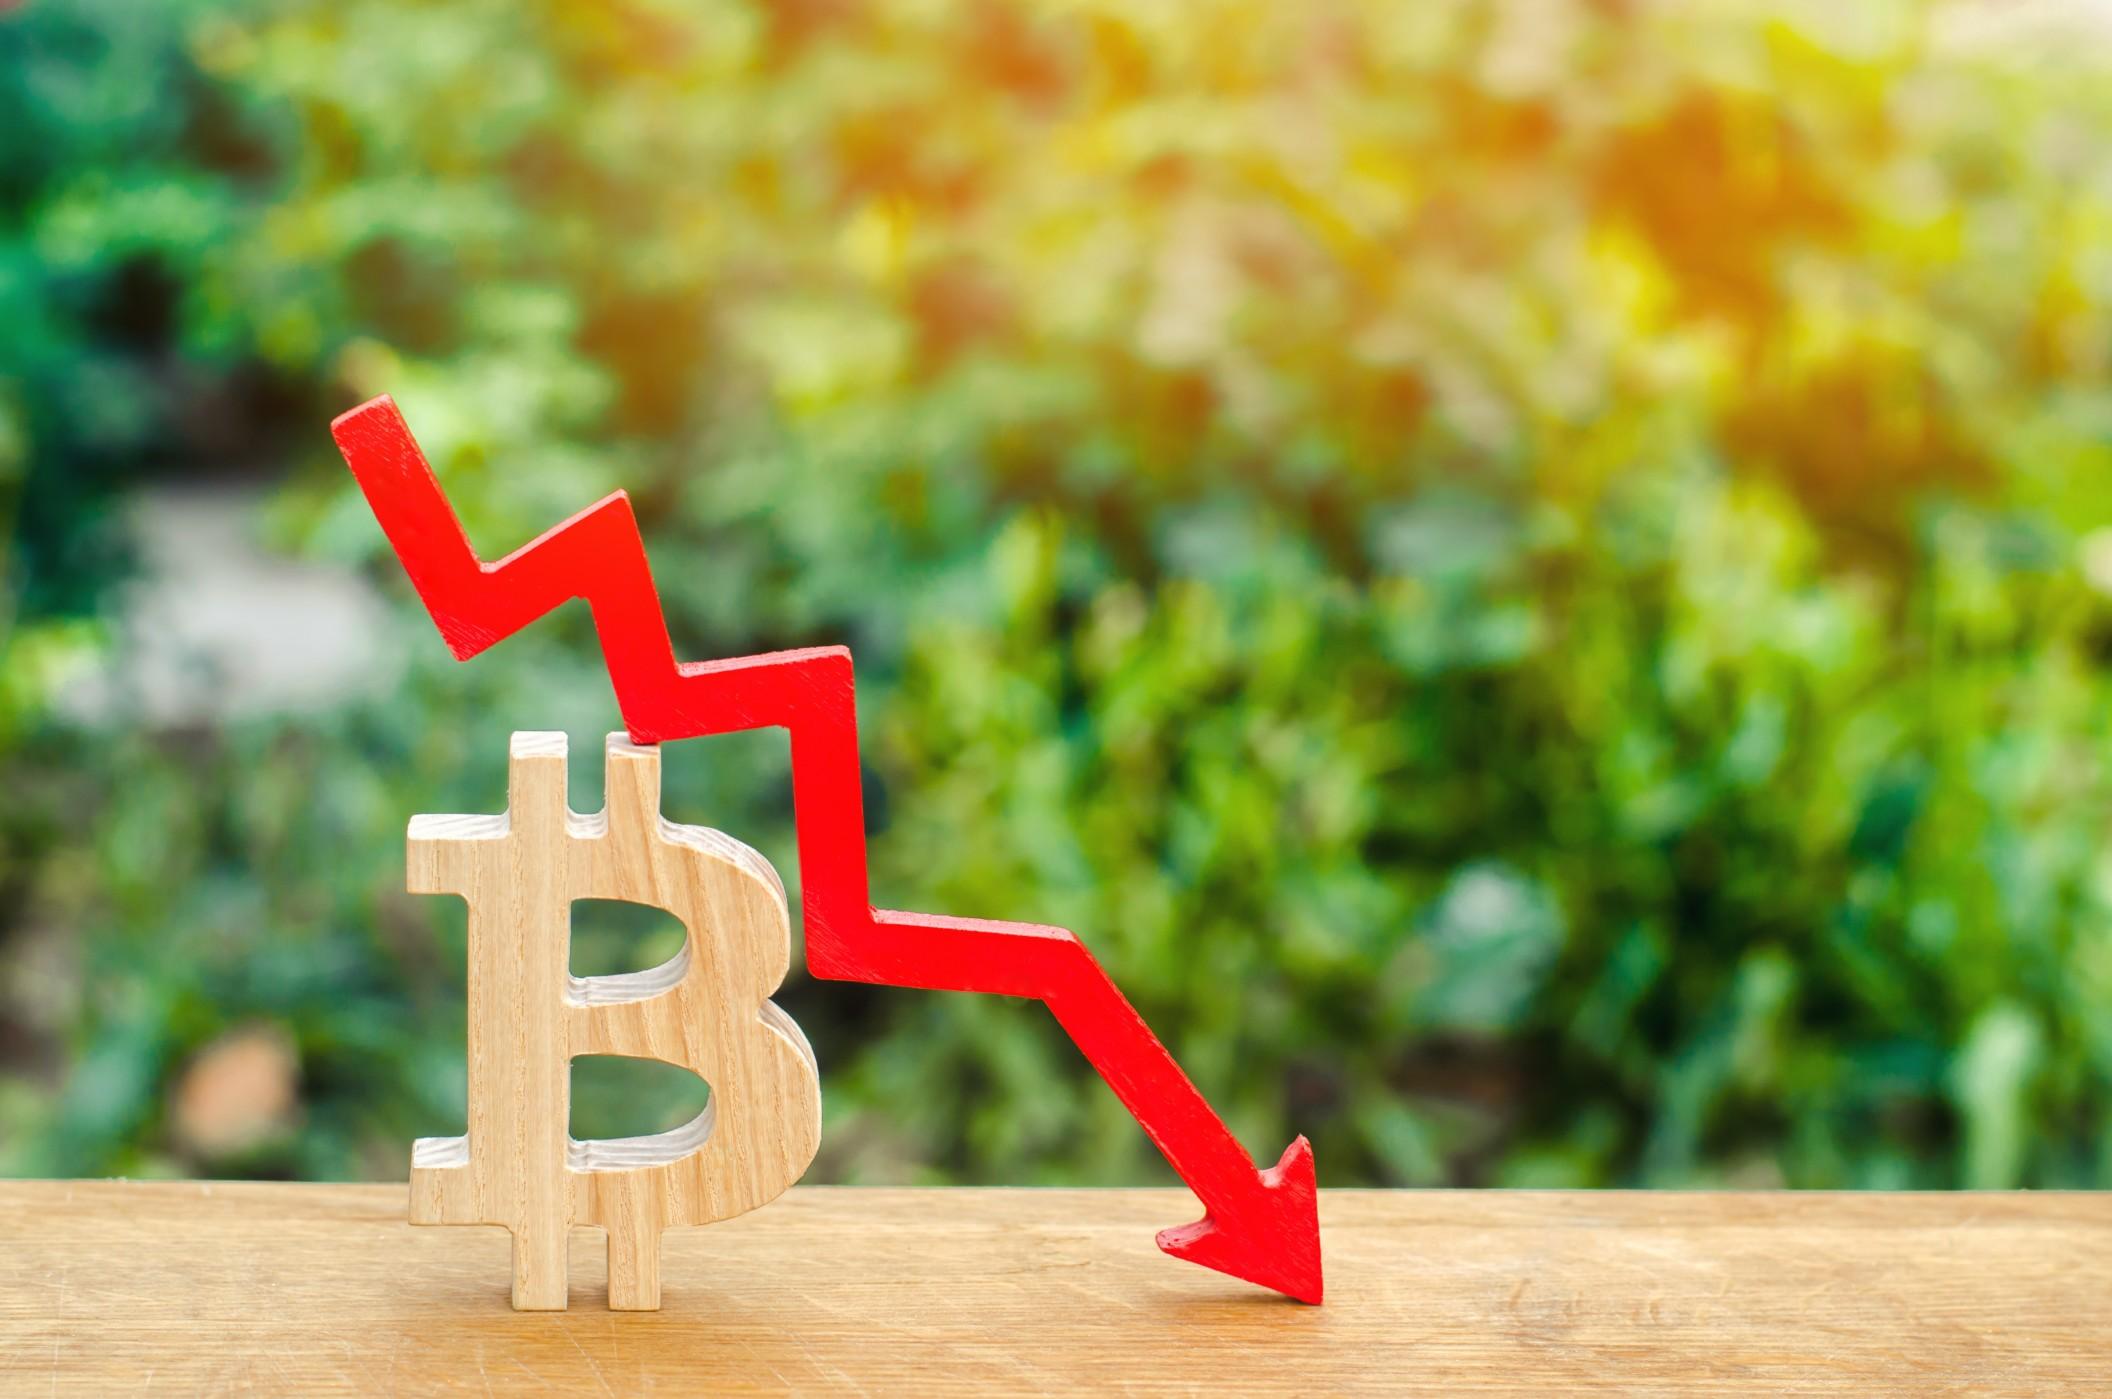 bitcoin btc fiyat analizi 3 eylul 2020